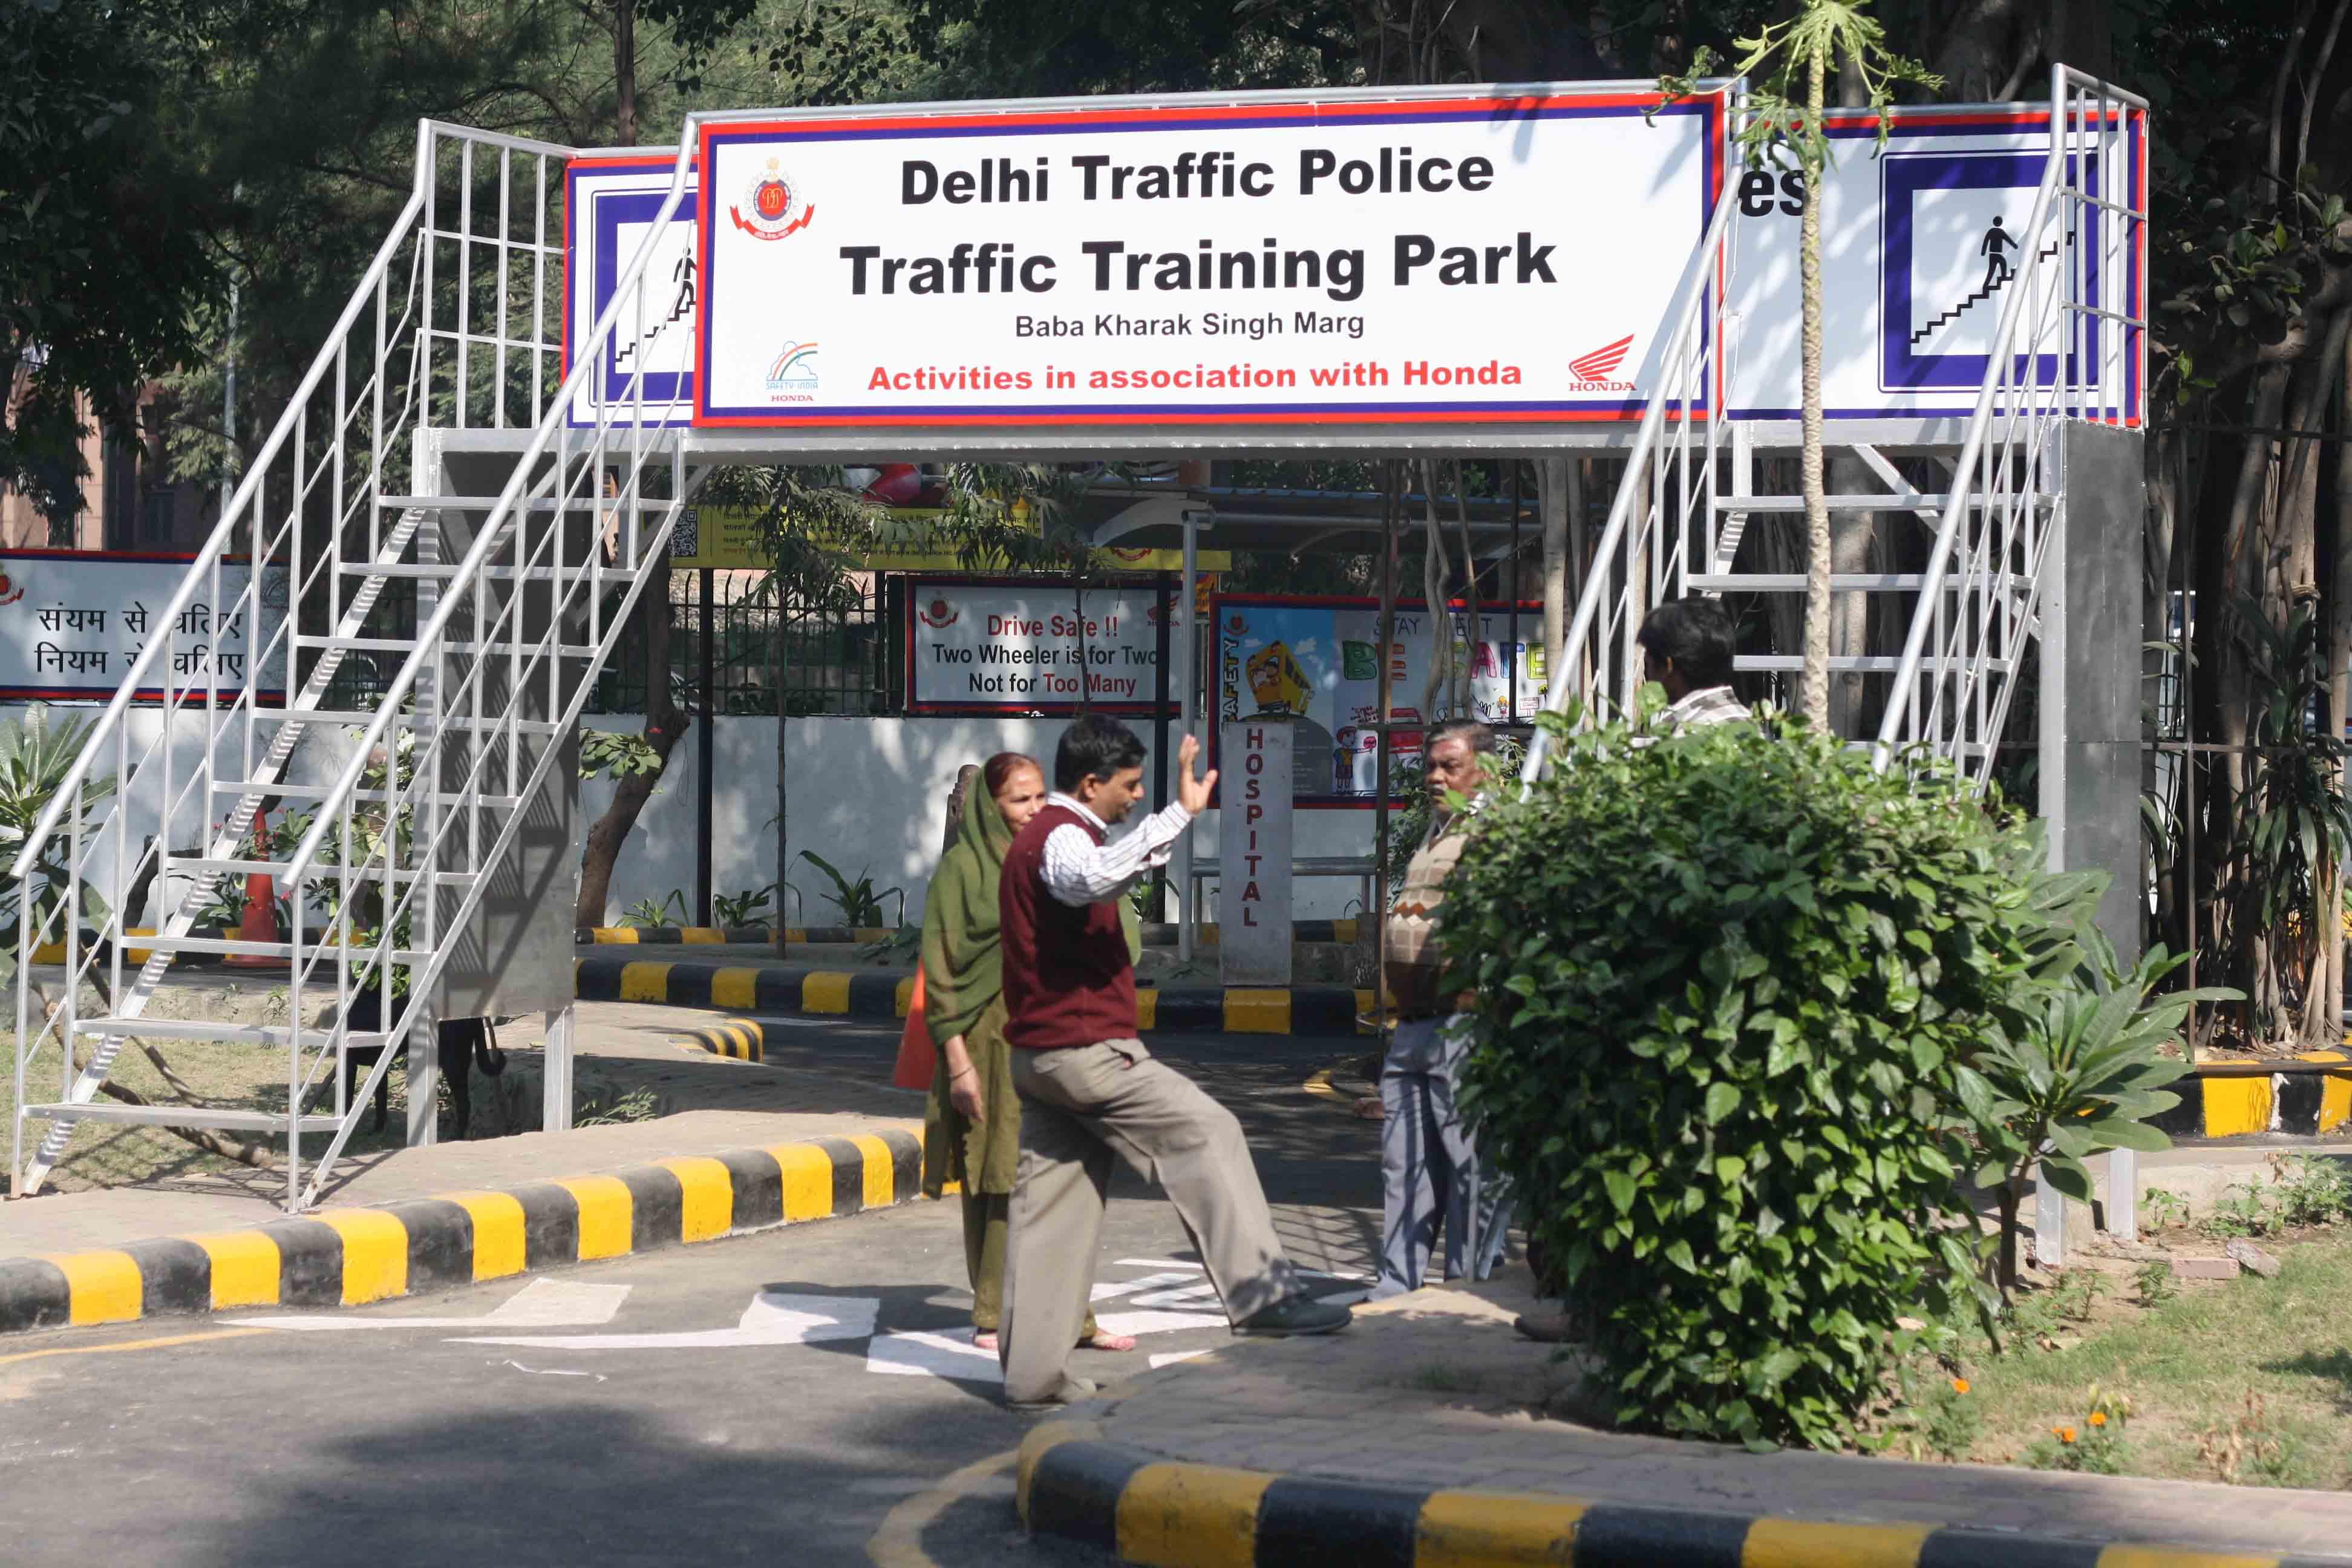 City Hangout - Traffic Training Park, Baba Kharak Singh Marg